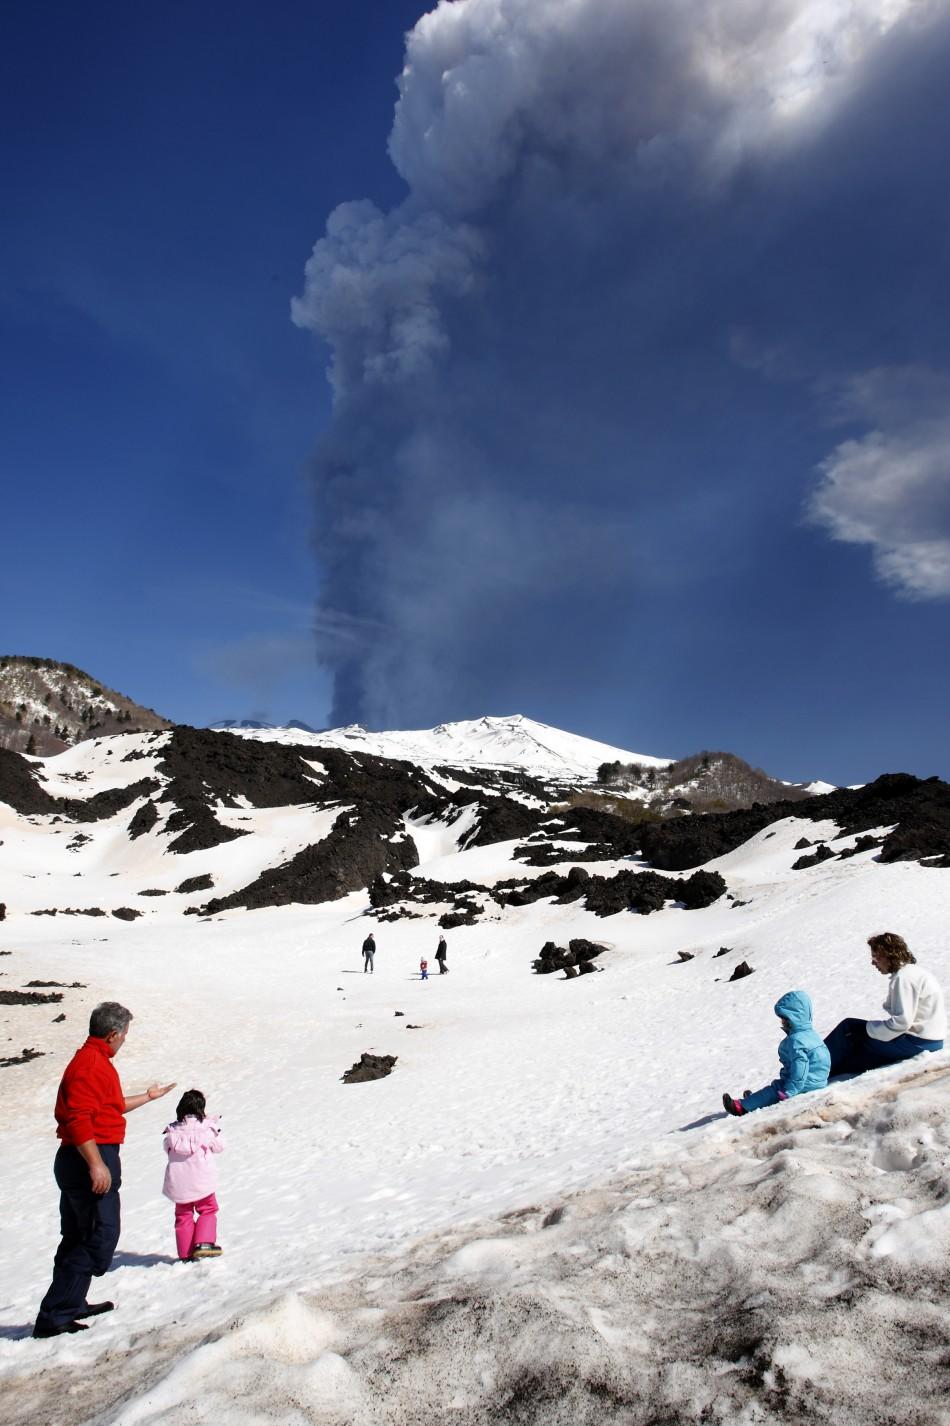 Mount etna rock dating pic